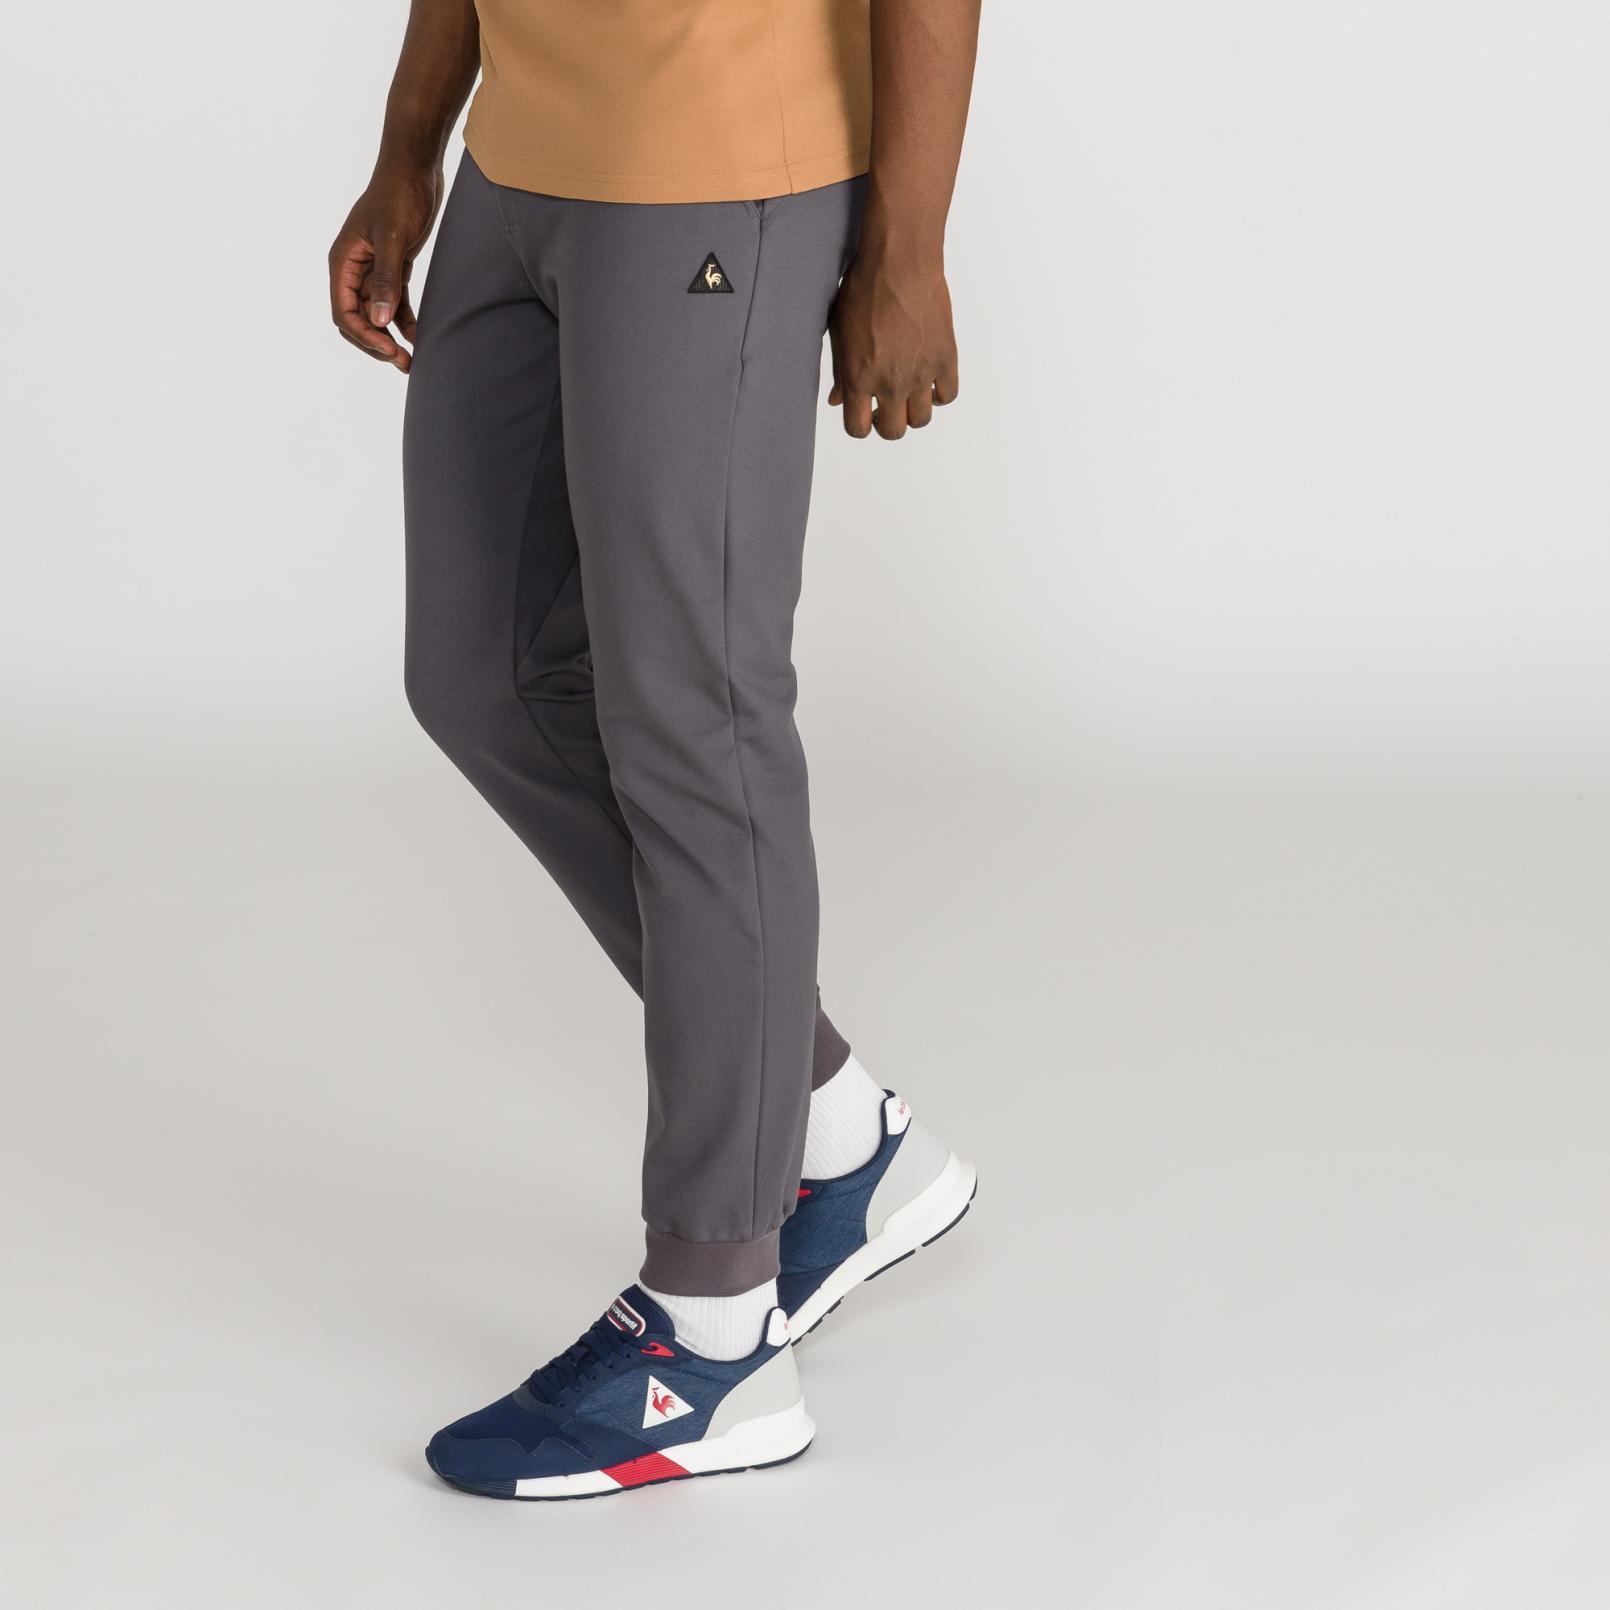 Pants – Le Coq Sportif Stadium Pant Grey